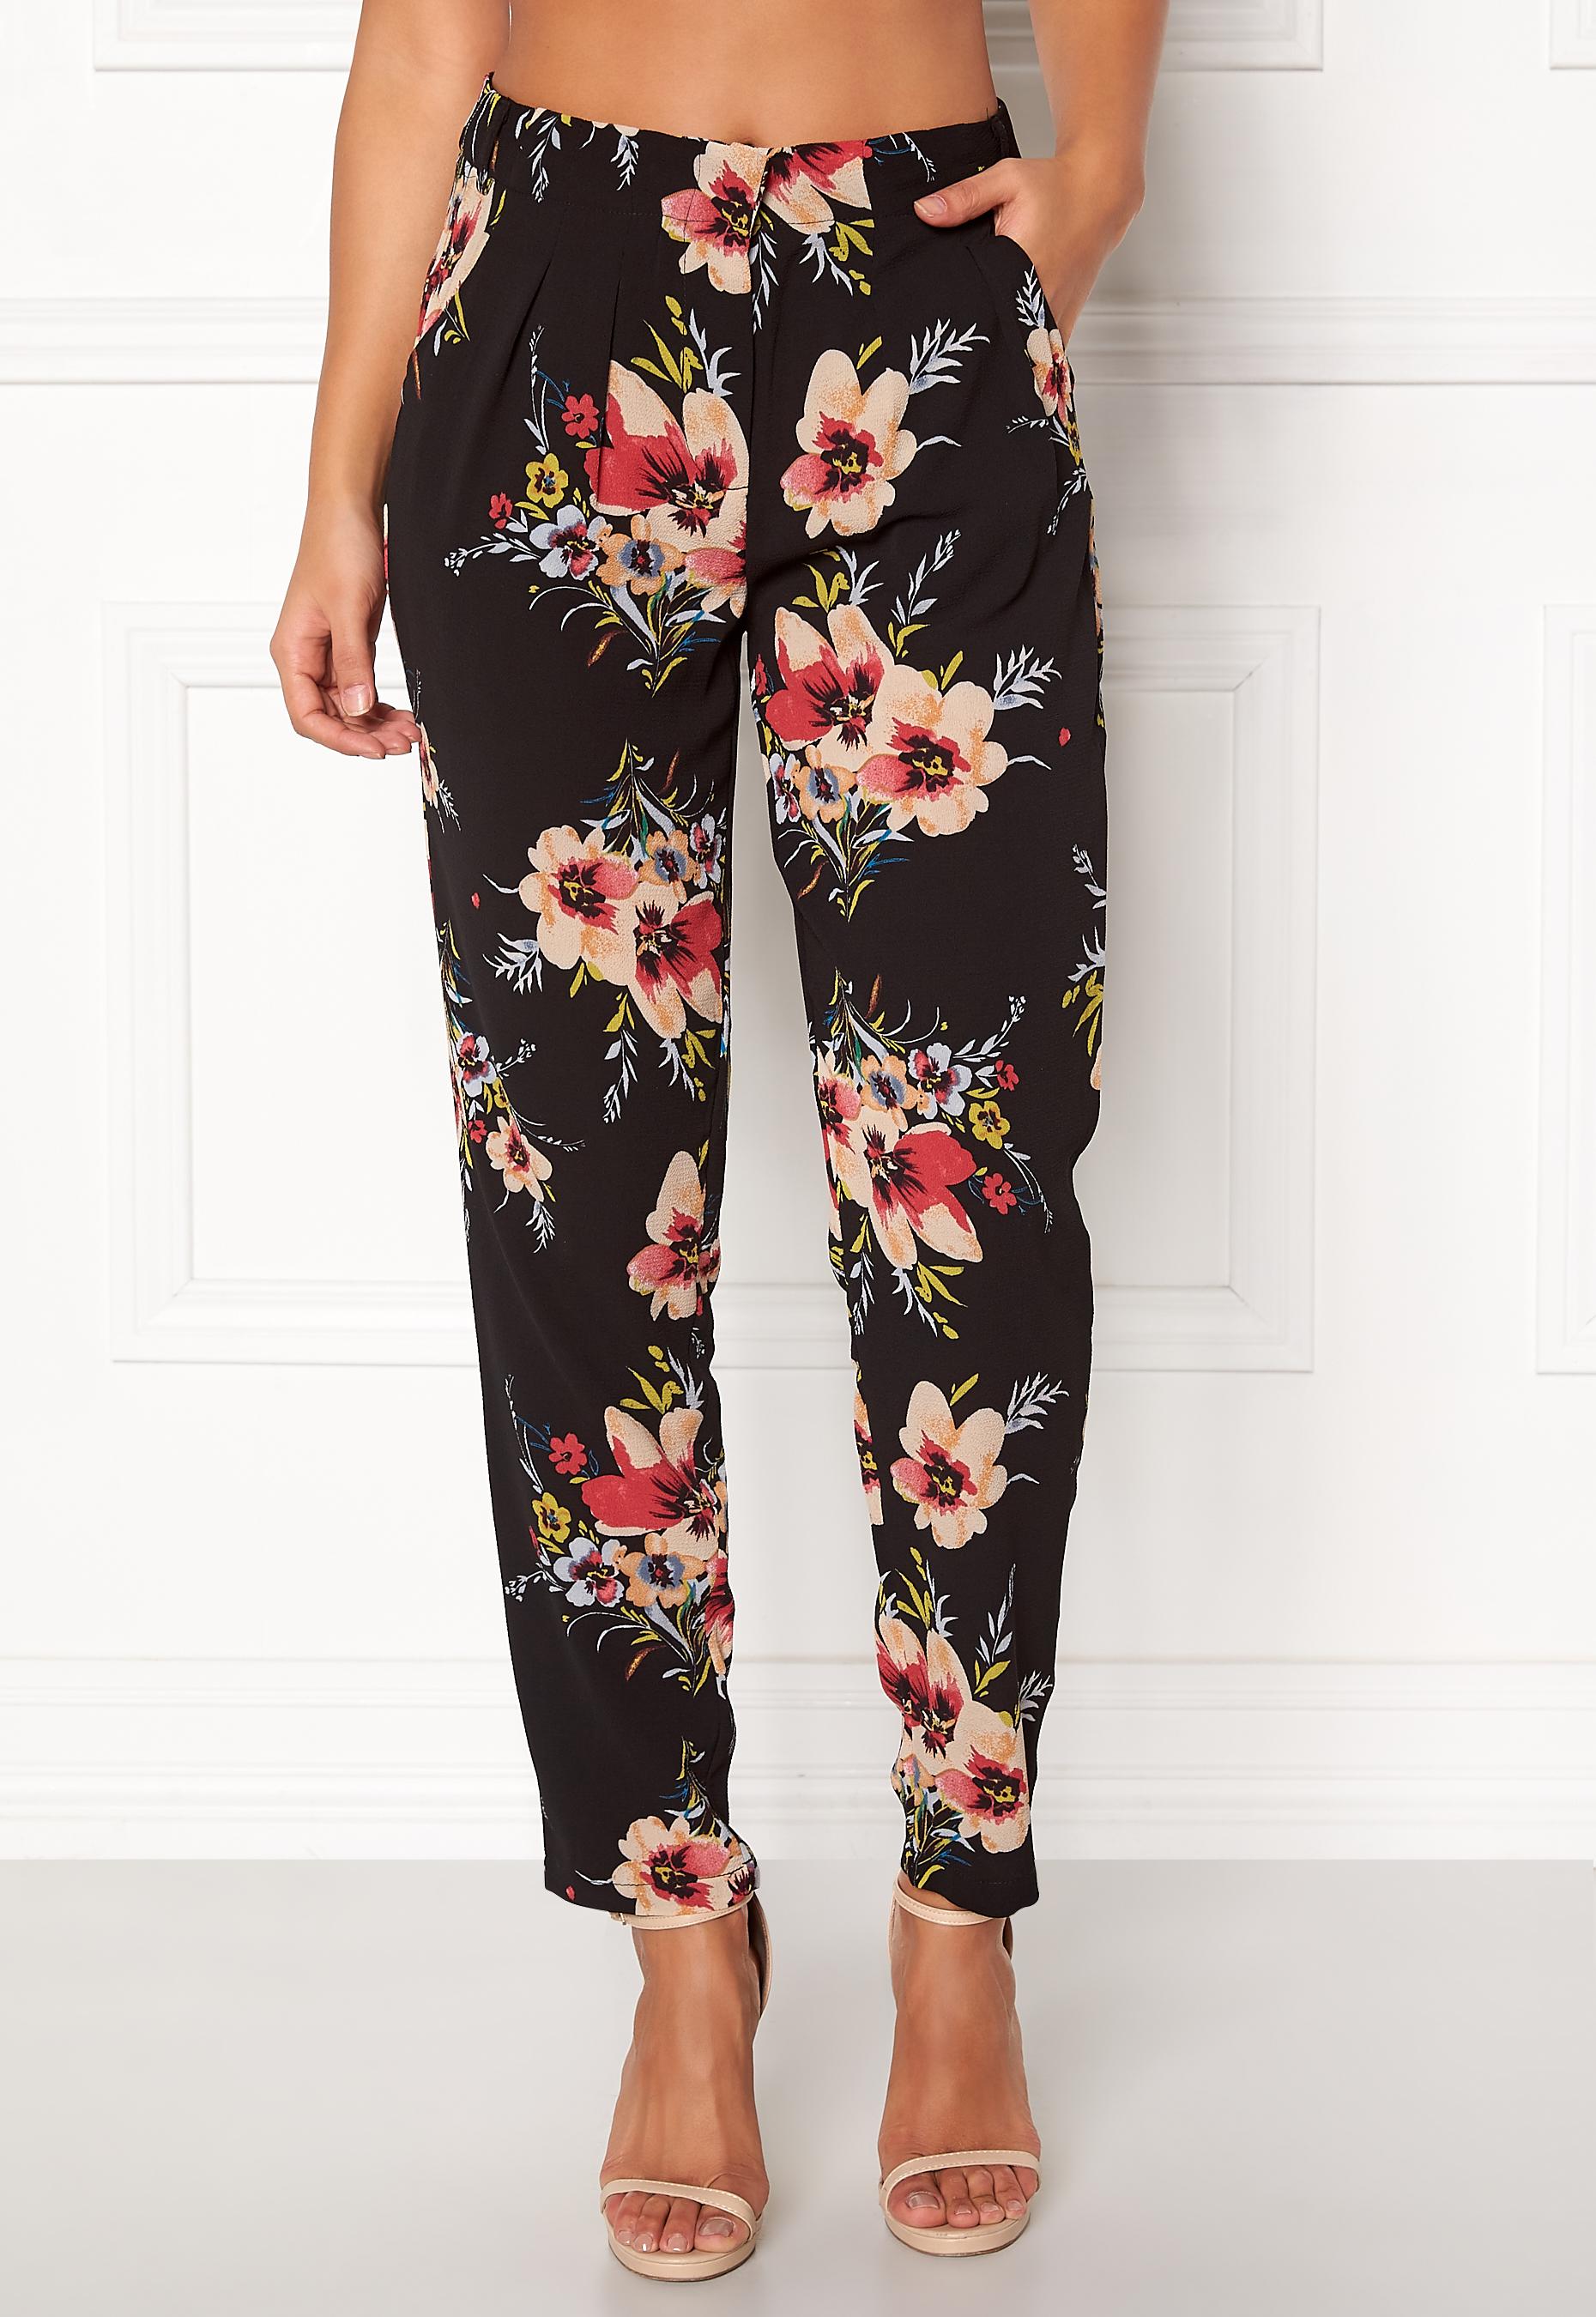 Rut & Circle Carina Flower Pant Vente Pas Cher Fiable TWIPf